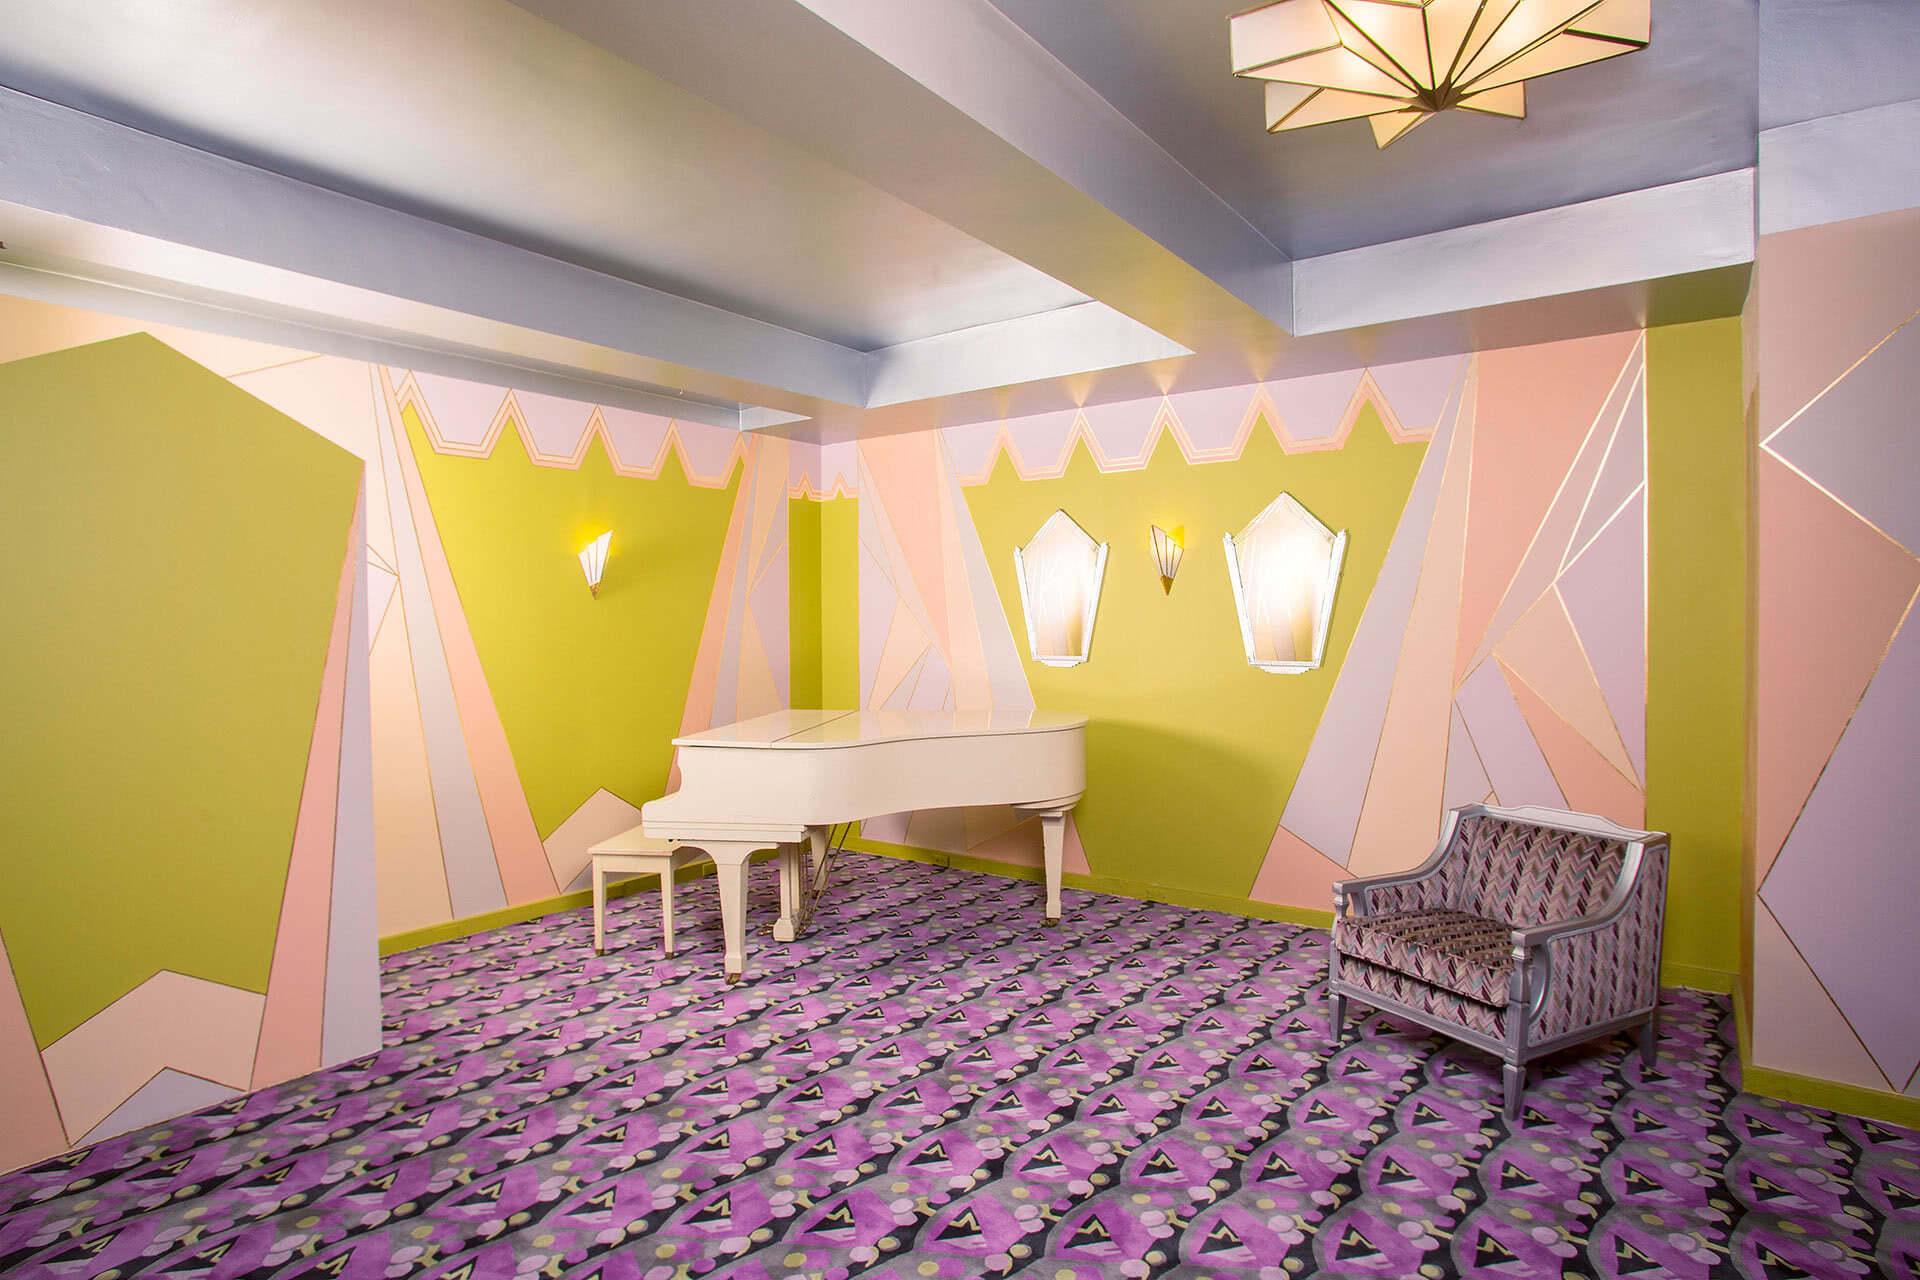 The State Theatre custom project futuristic room